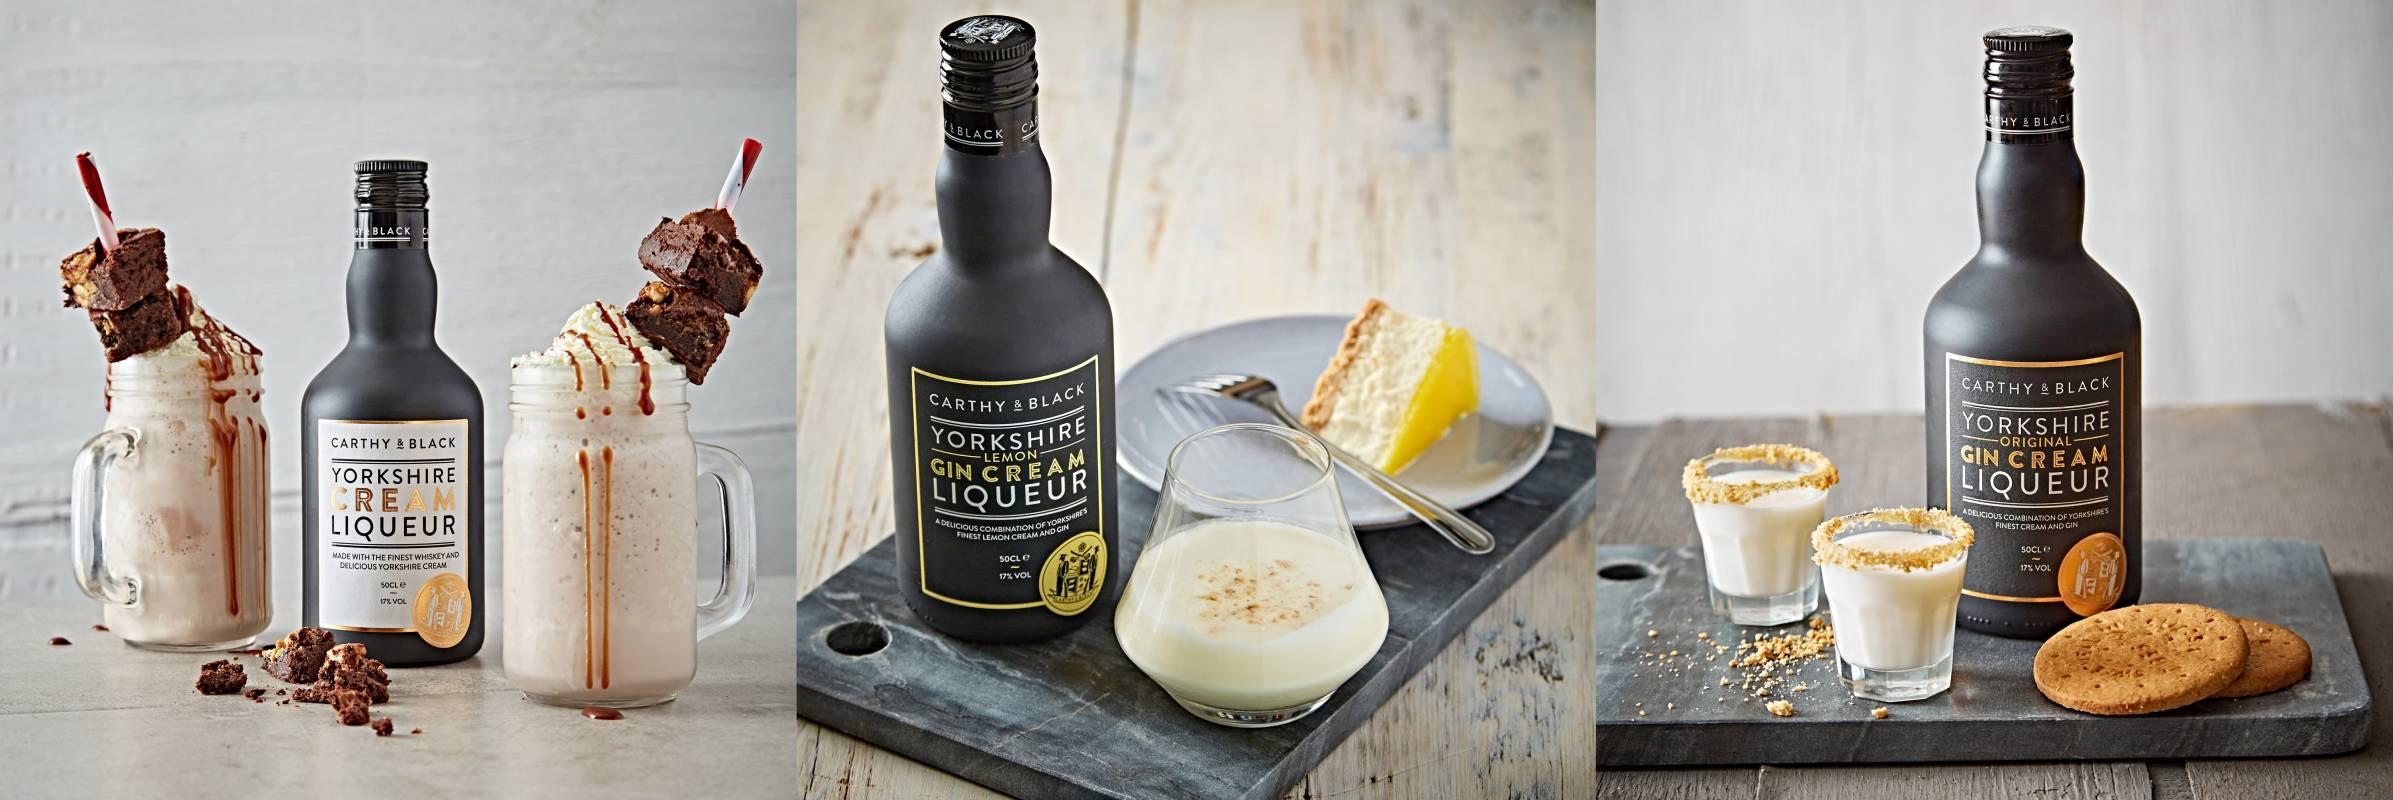 Carthy & Black Yorkshire Cream Liqueur